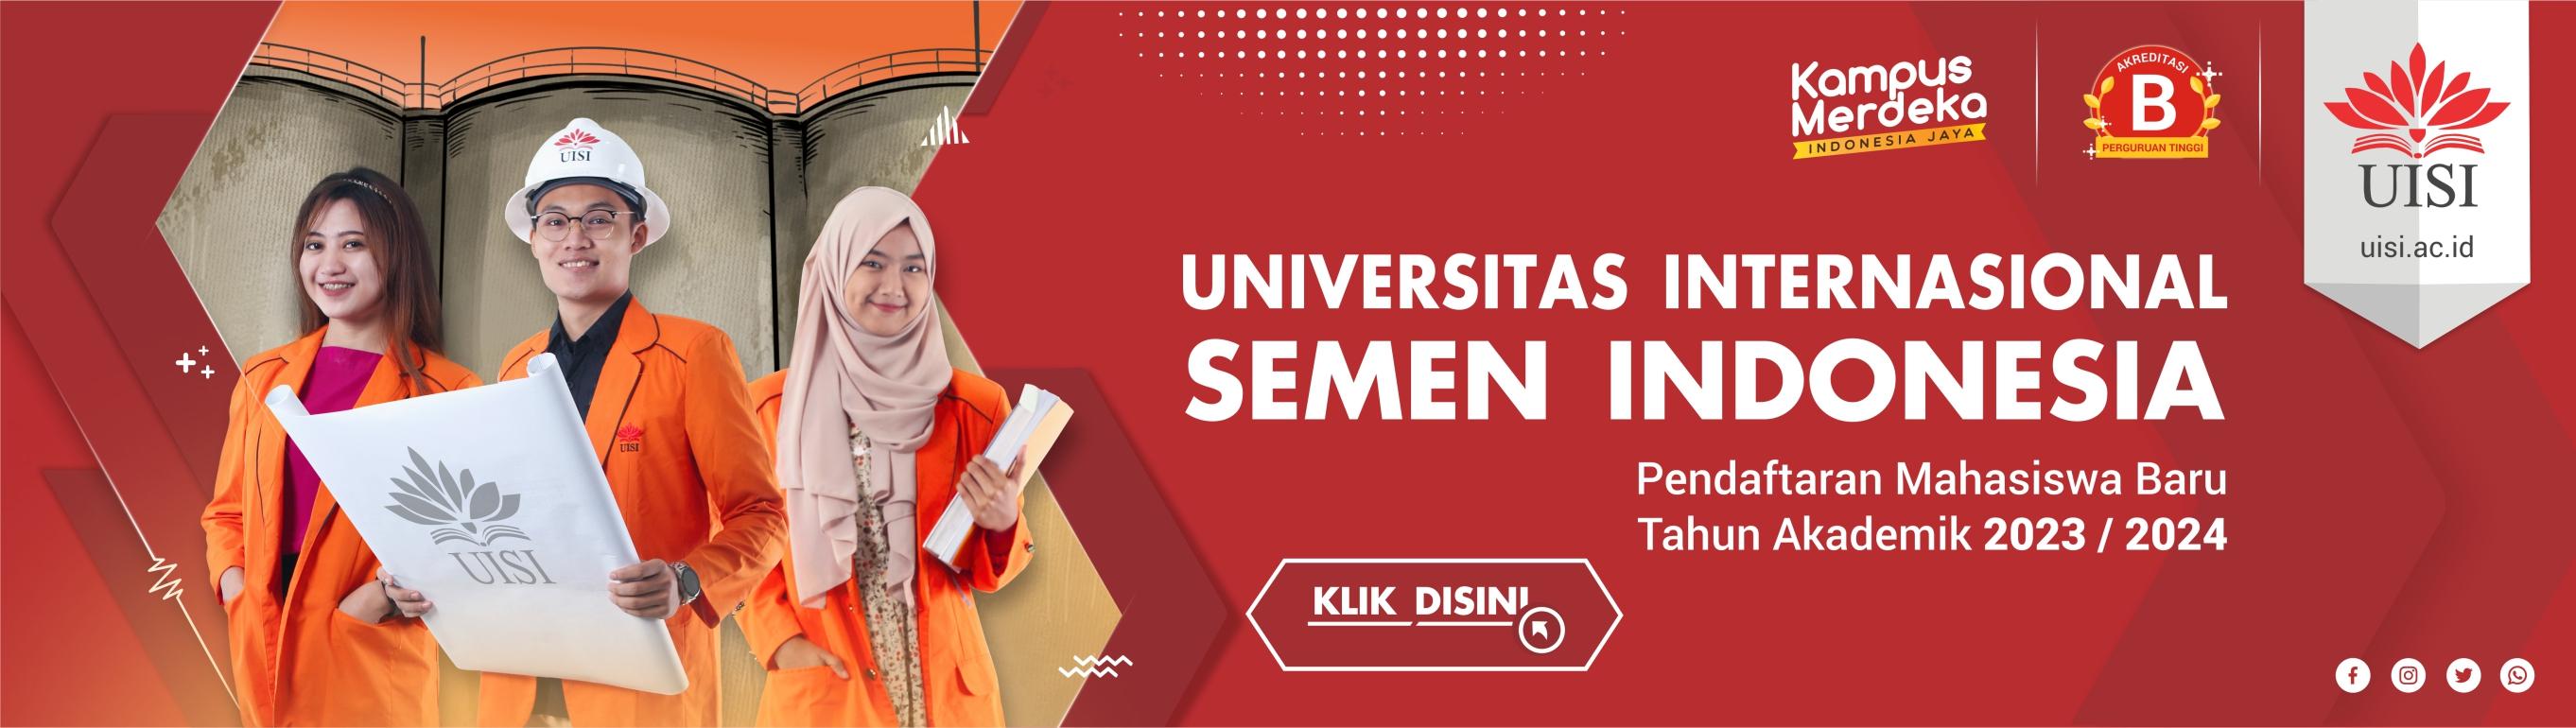 Universitas Internasional Semen Indonesia (UISI)